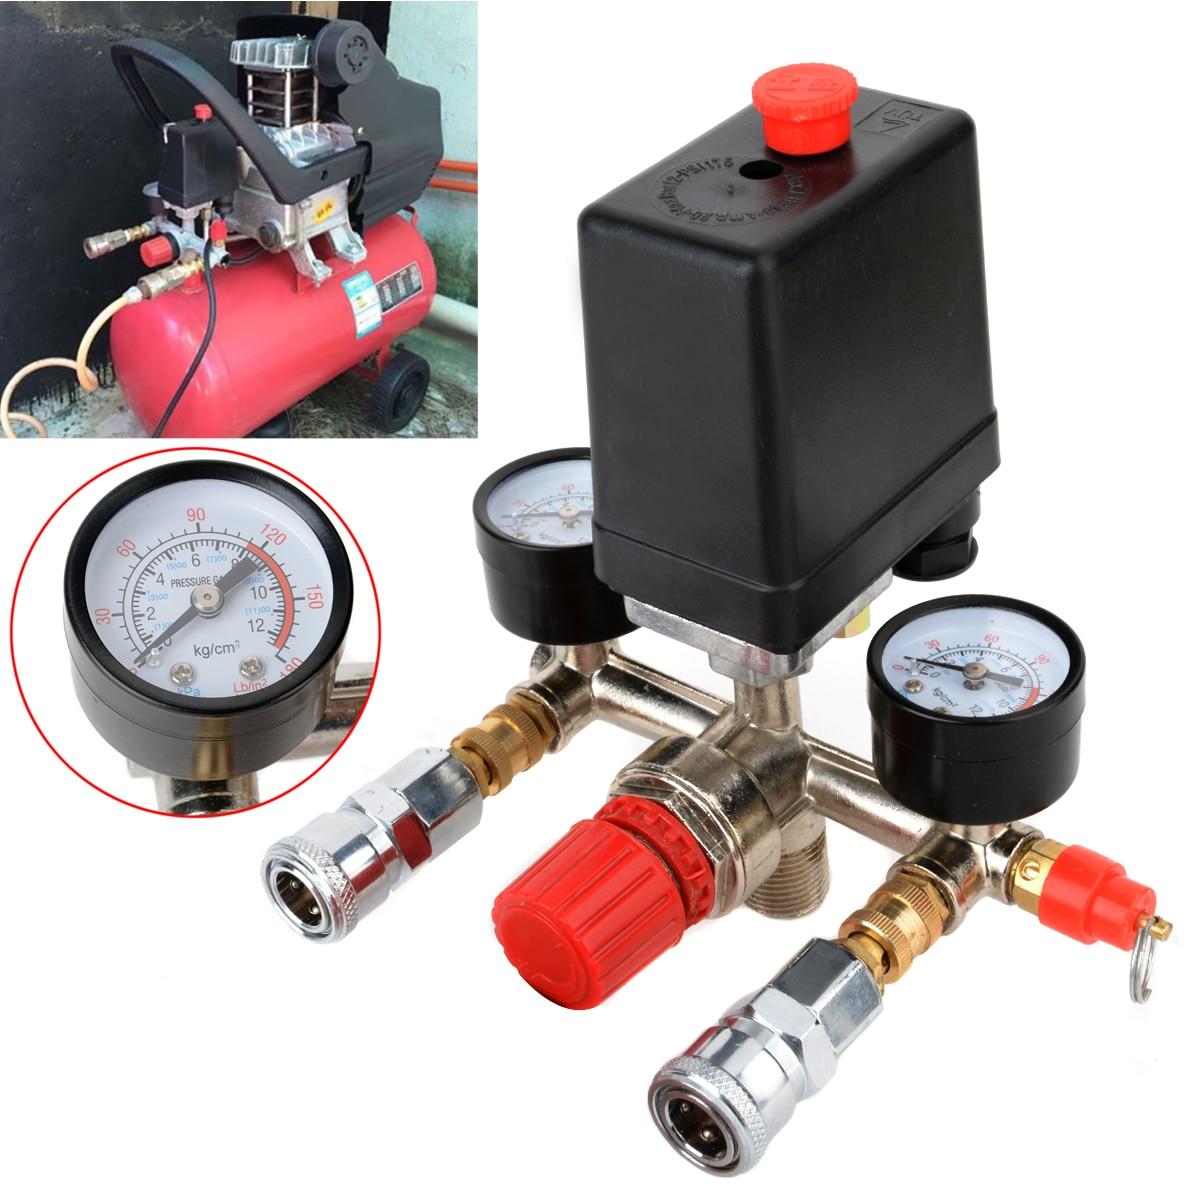 1 pc Compressor de Ar Pressão Interruptor Da Válvula Manifold Calibres Regulador 90-120PSI 82x82x52mm